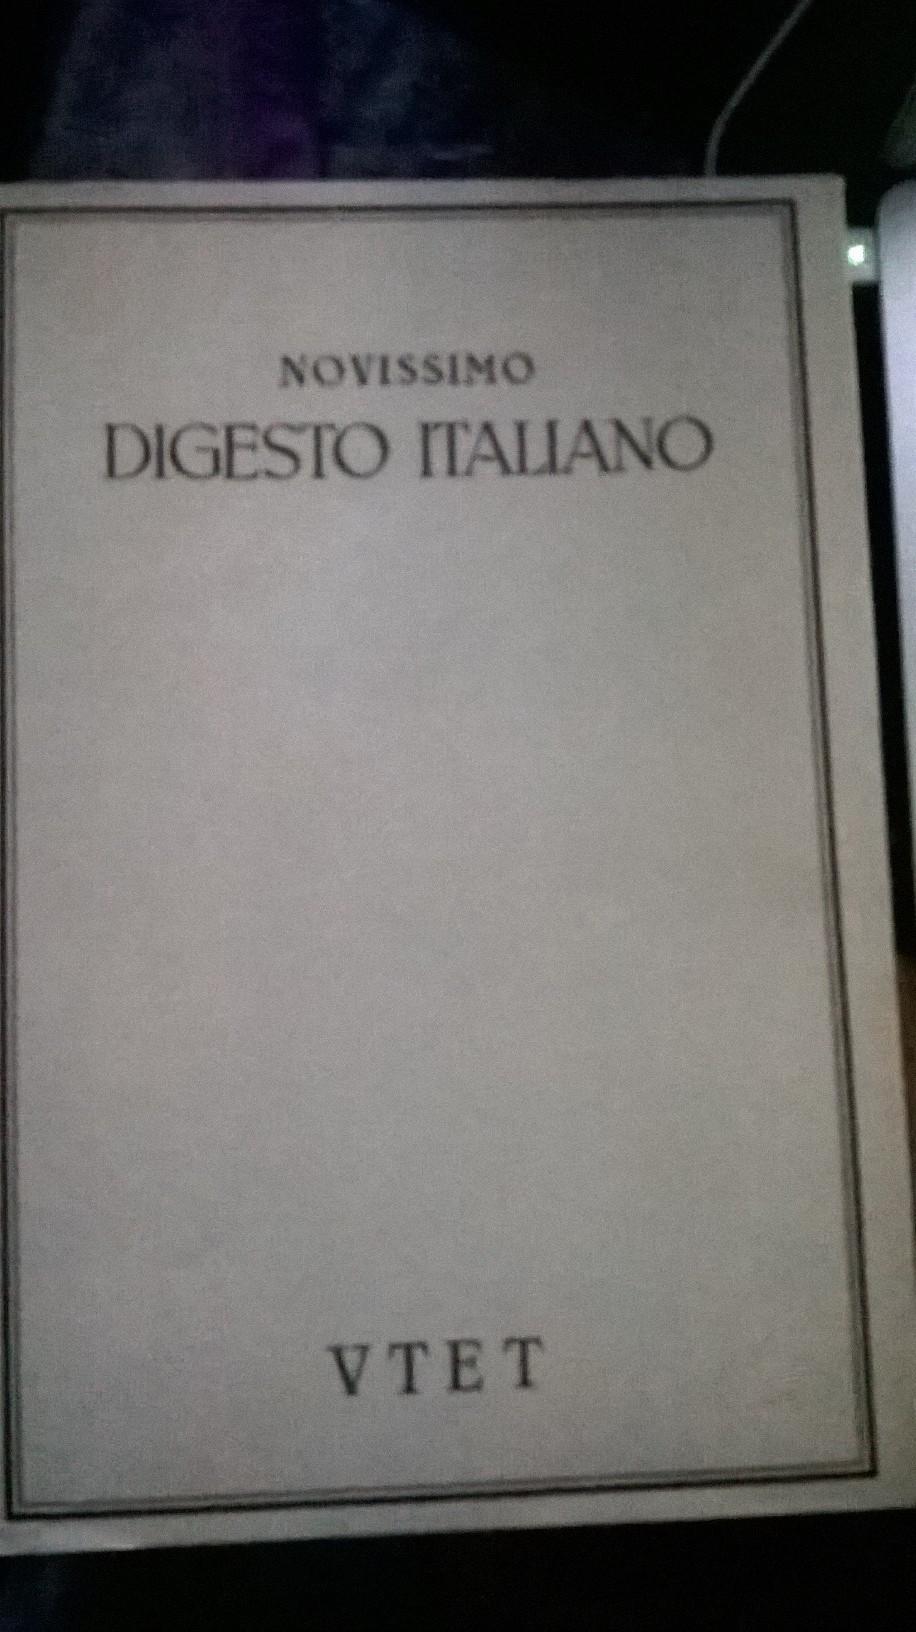 Novissimo digesto italiano Vol. XIX